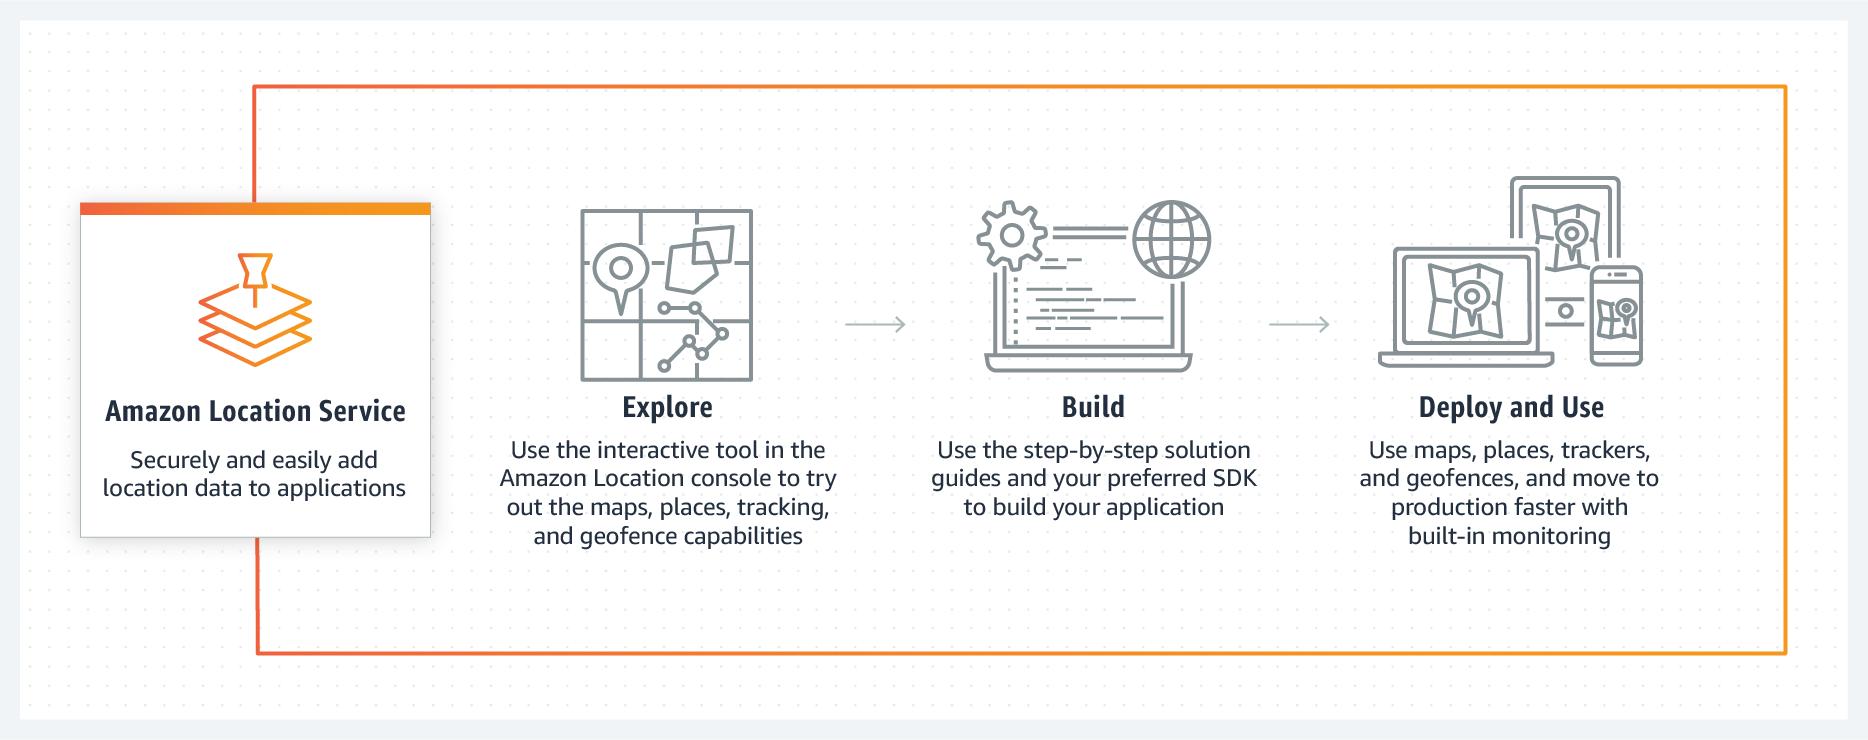 Amazon Location Service - How it works